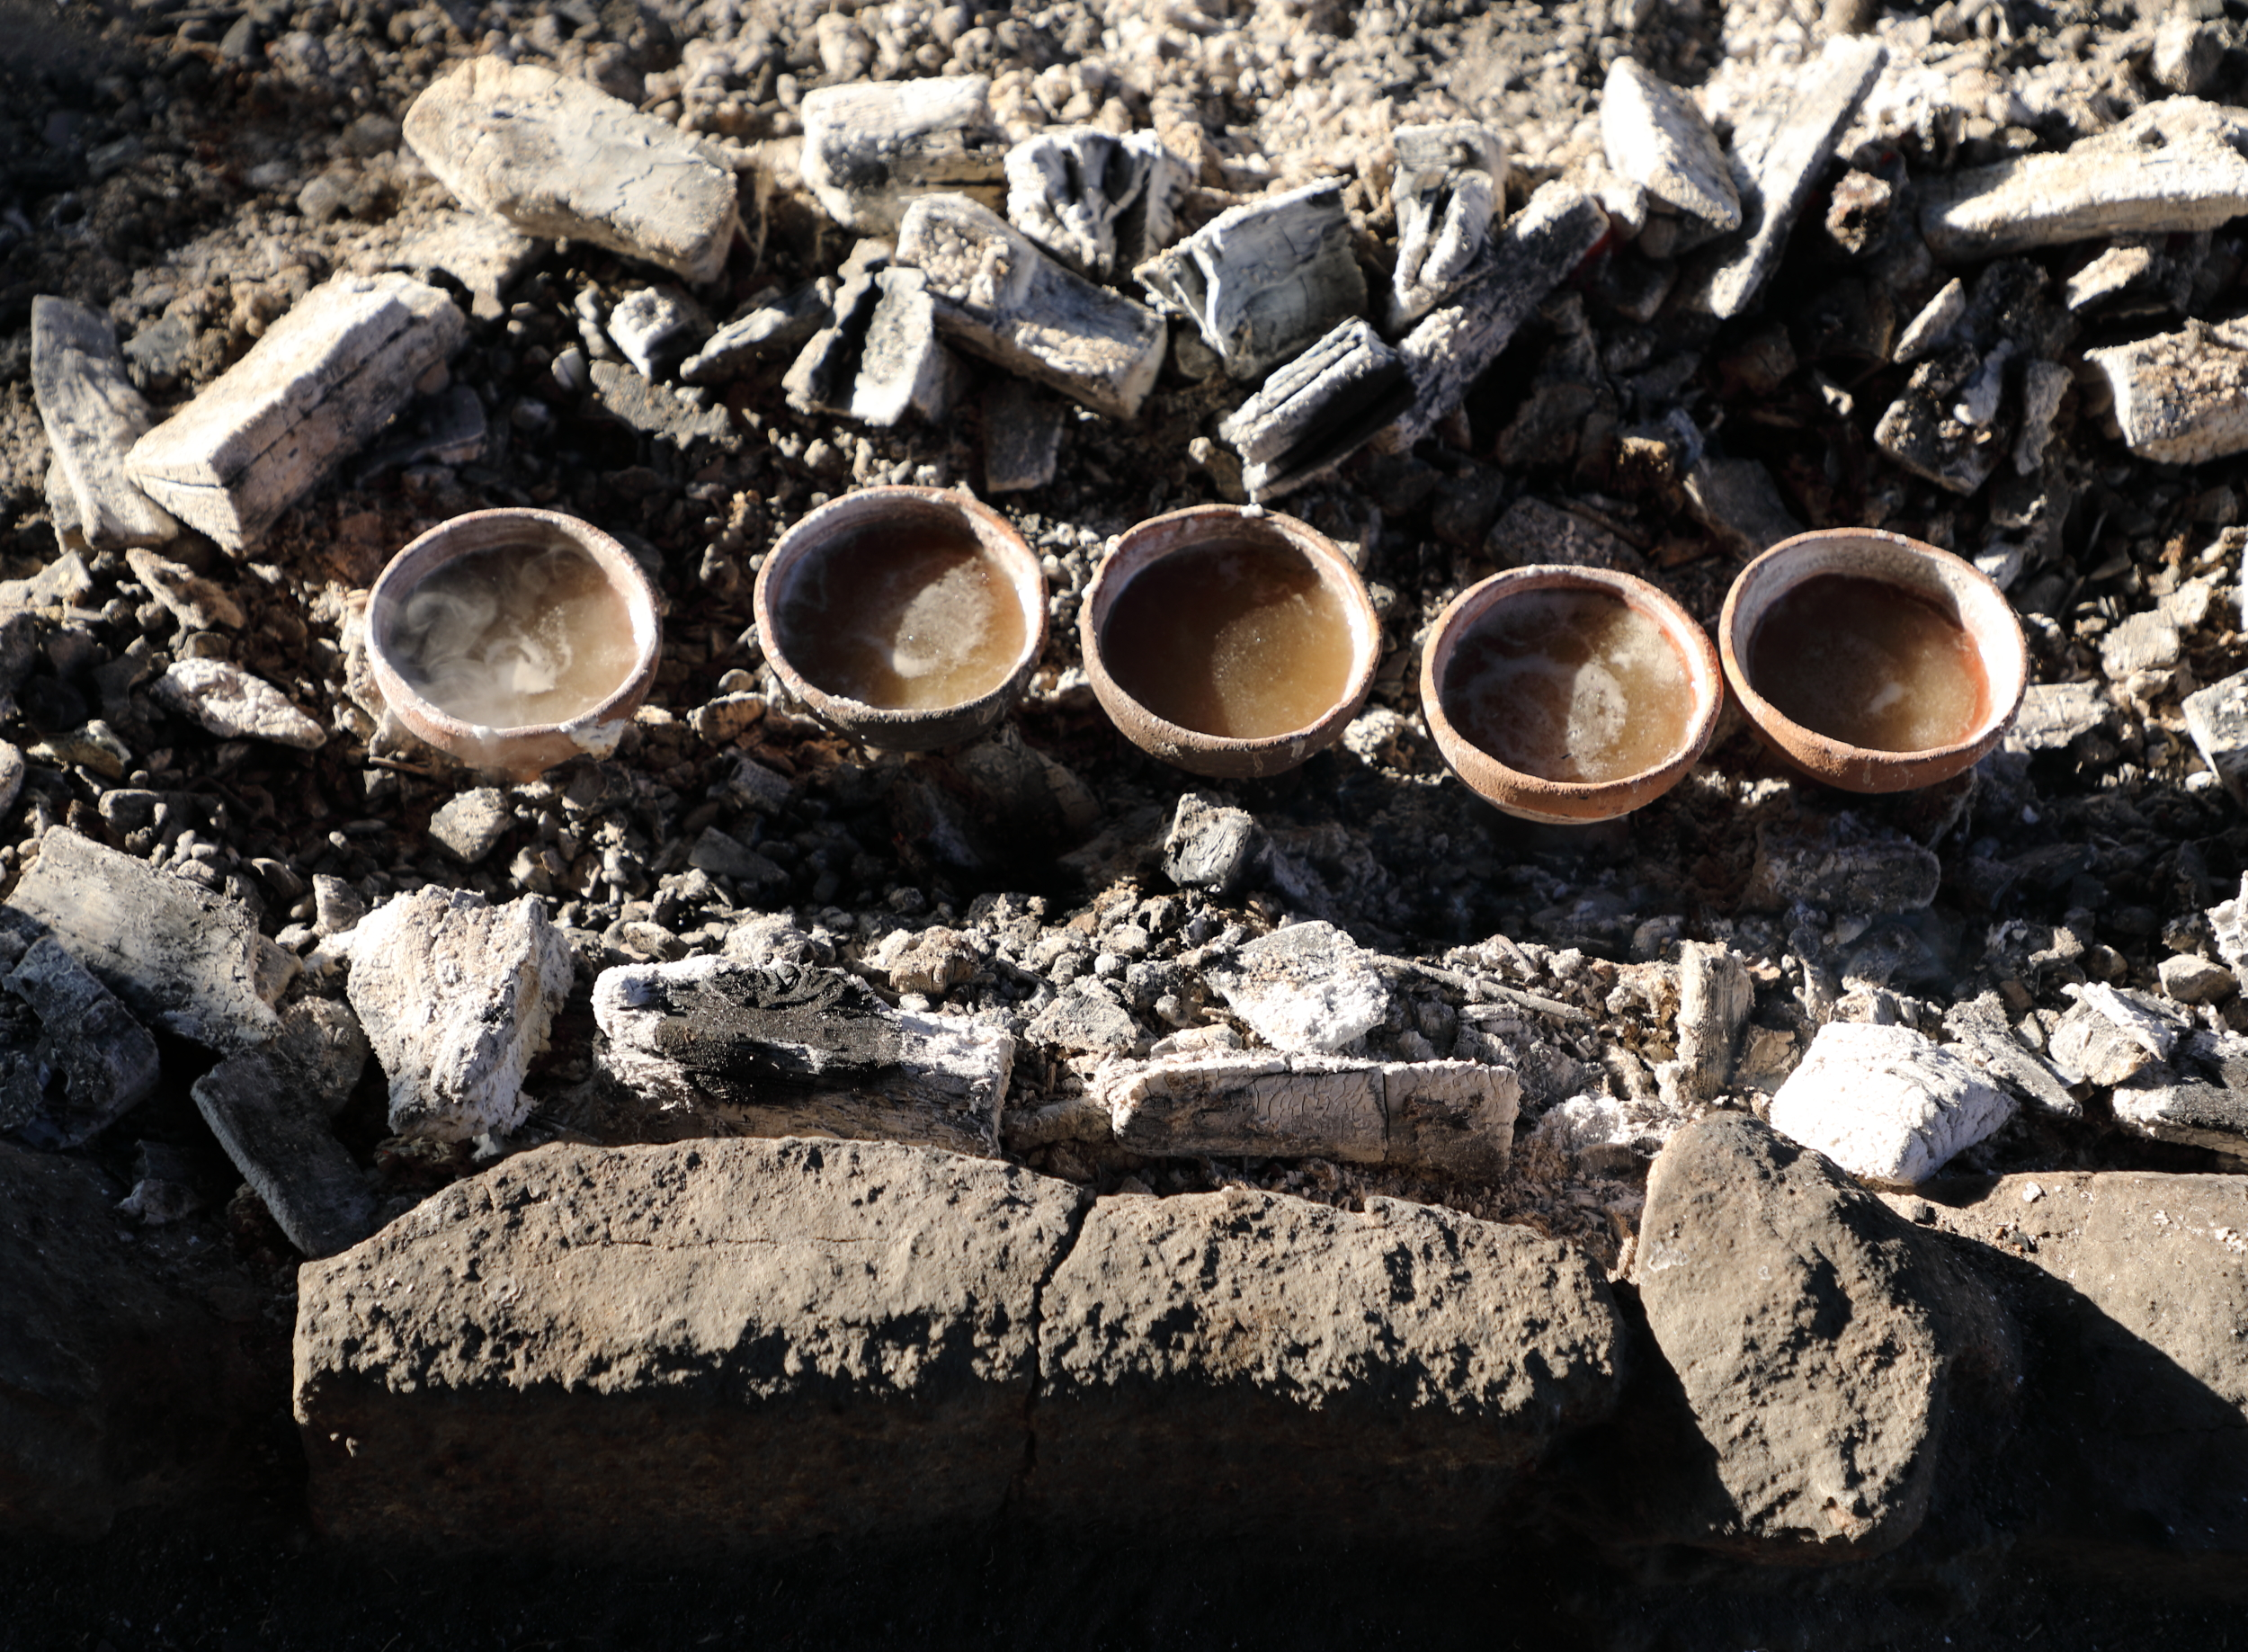 Recreation of ancient moshio salt making on a beach at Kami-kamagari Island in Japan's Seto Island Sea based on artifacts and ruins found nearby.